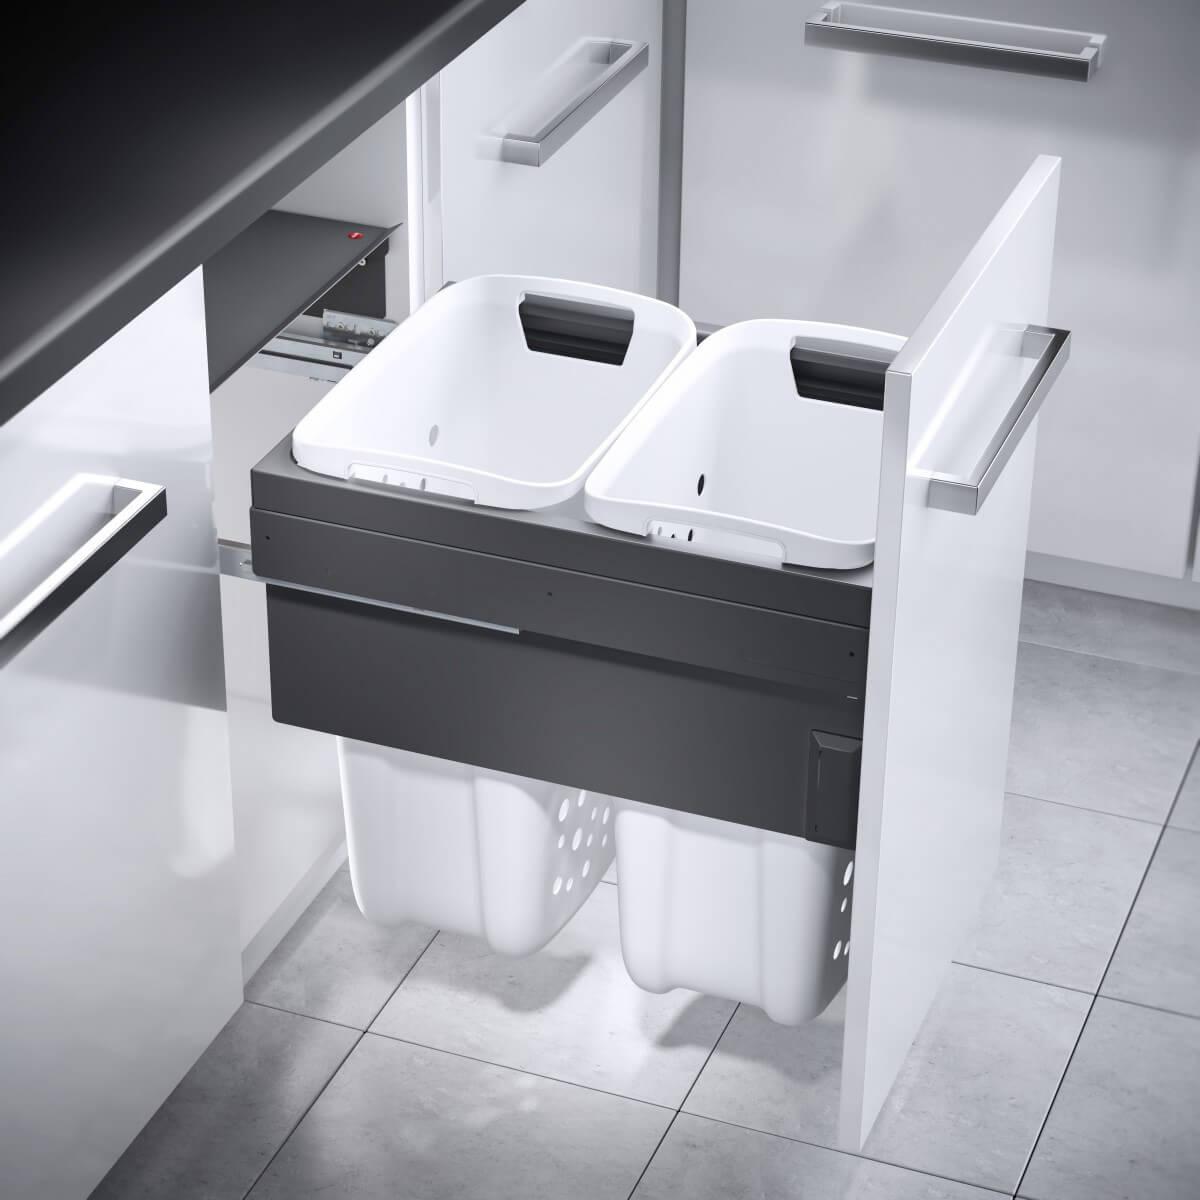 Hailo Laundry Carrier 450 dunkelgrau